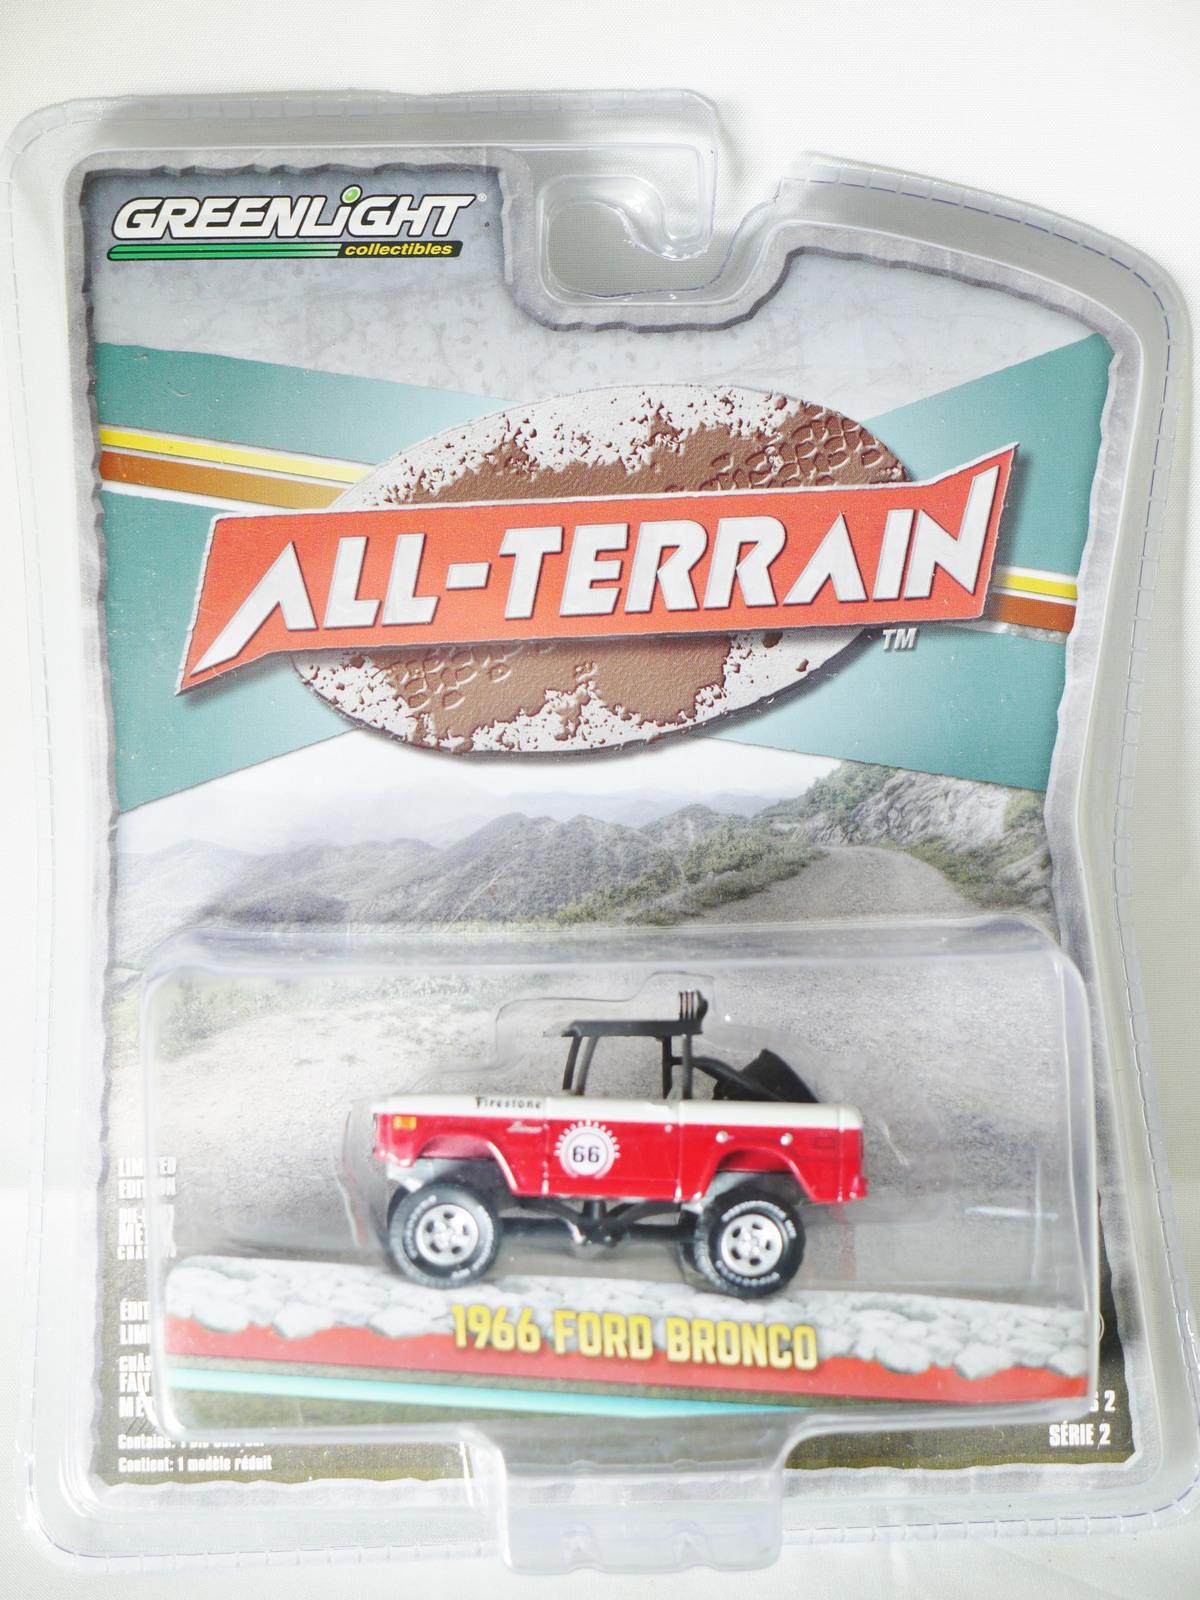 Greenlight col   all terrain s2   1966 ford bronco   01